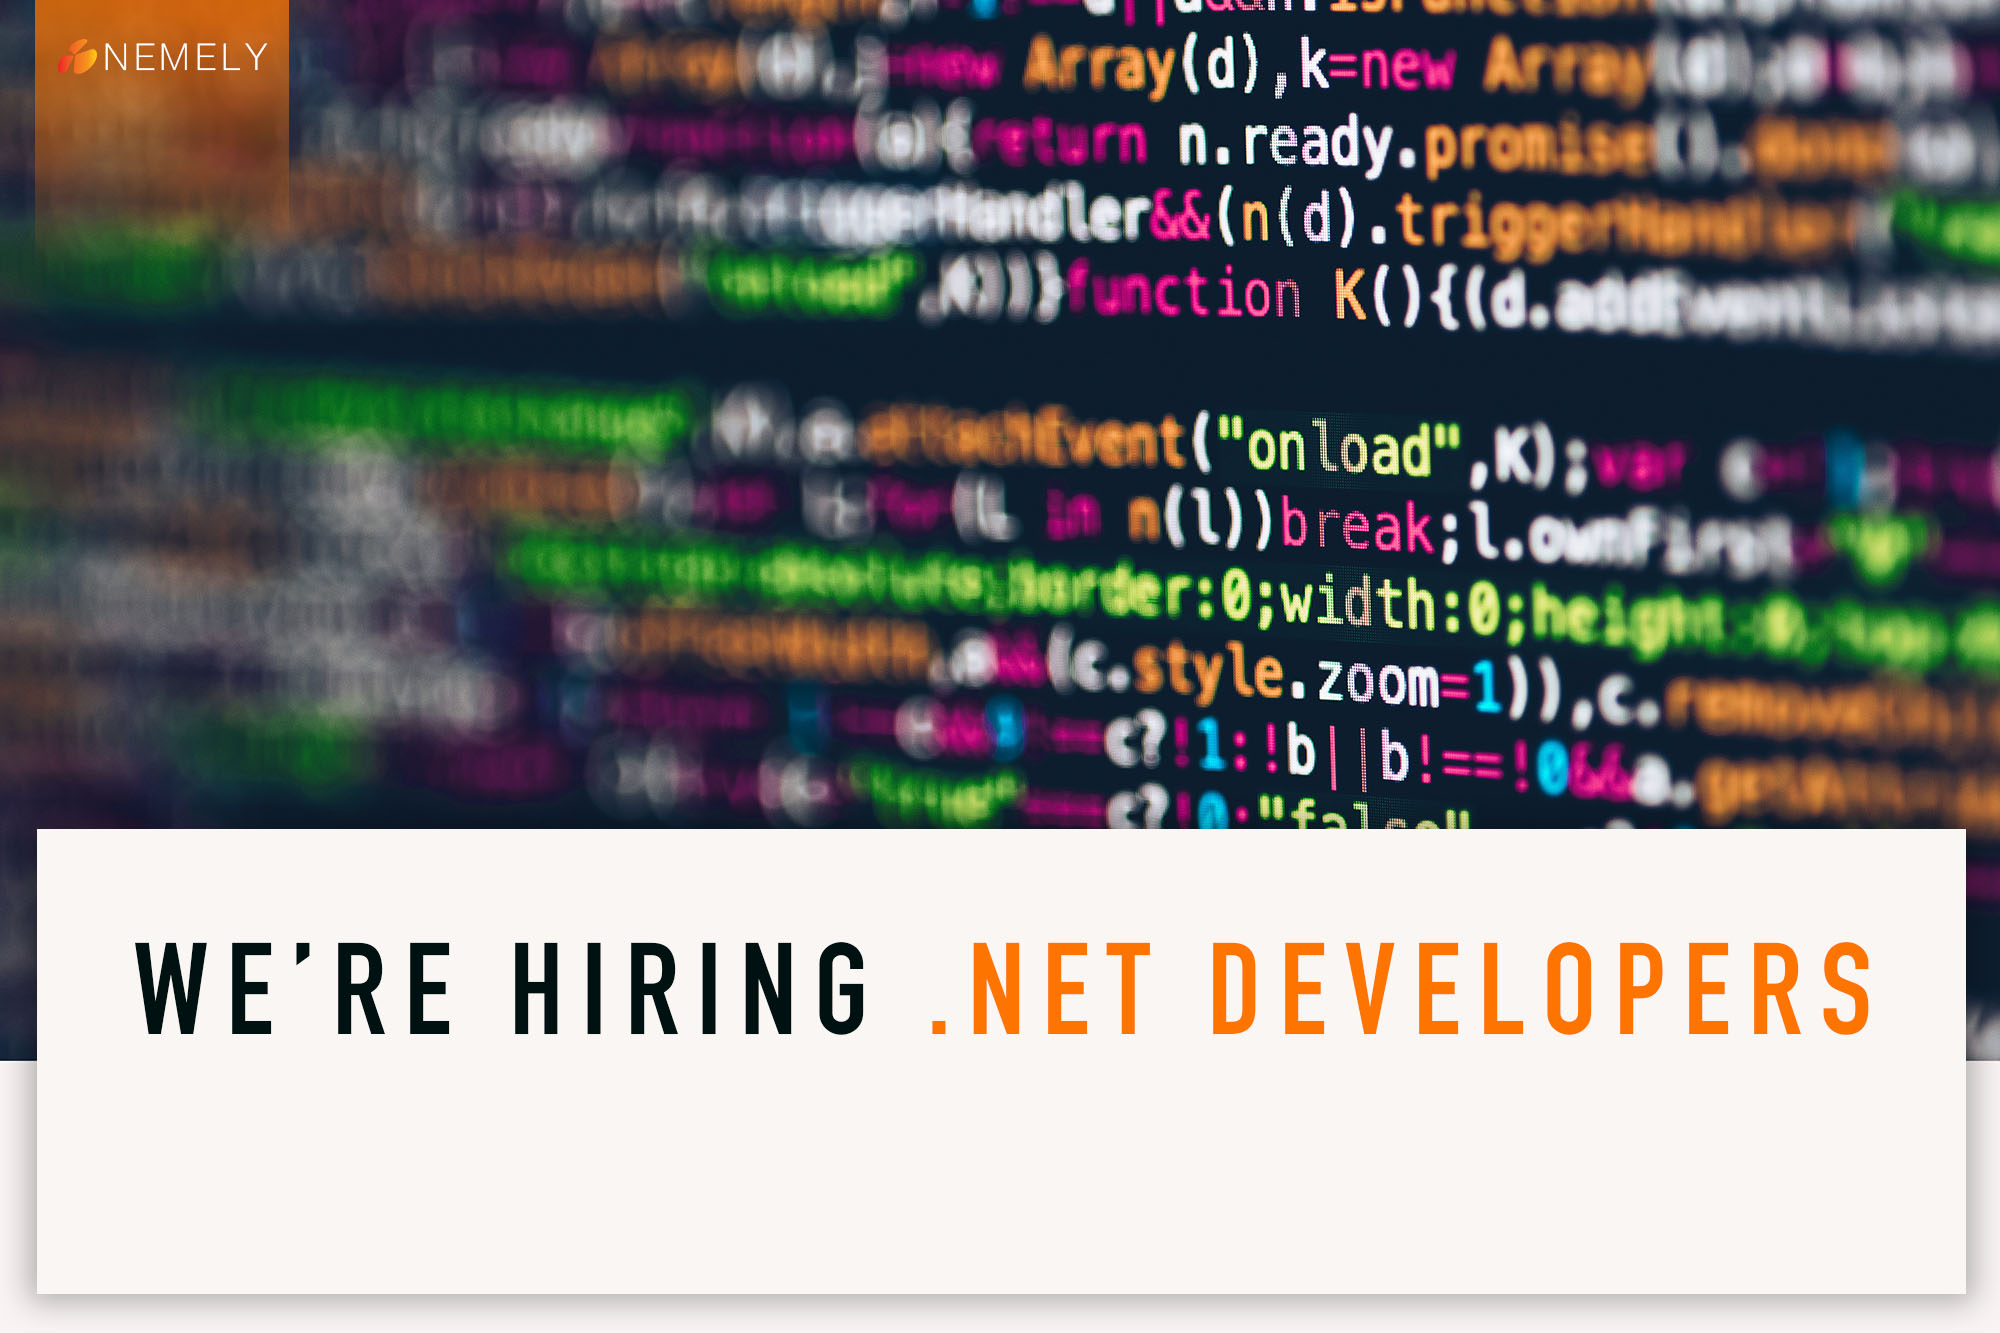 We're Hiring .NET Developer